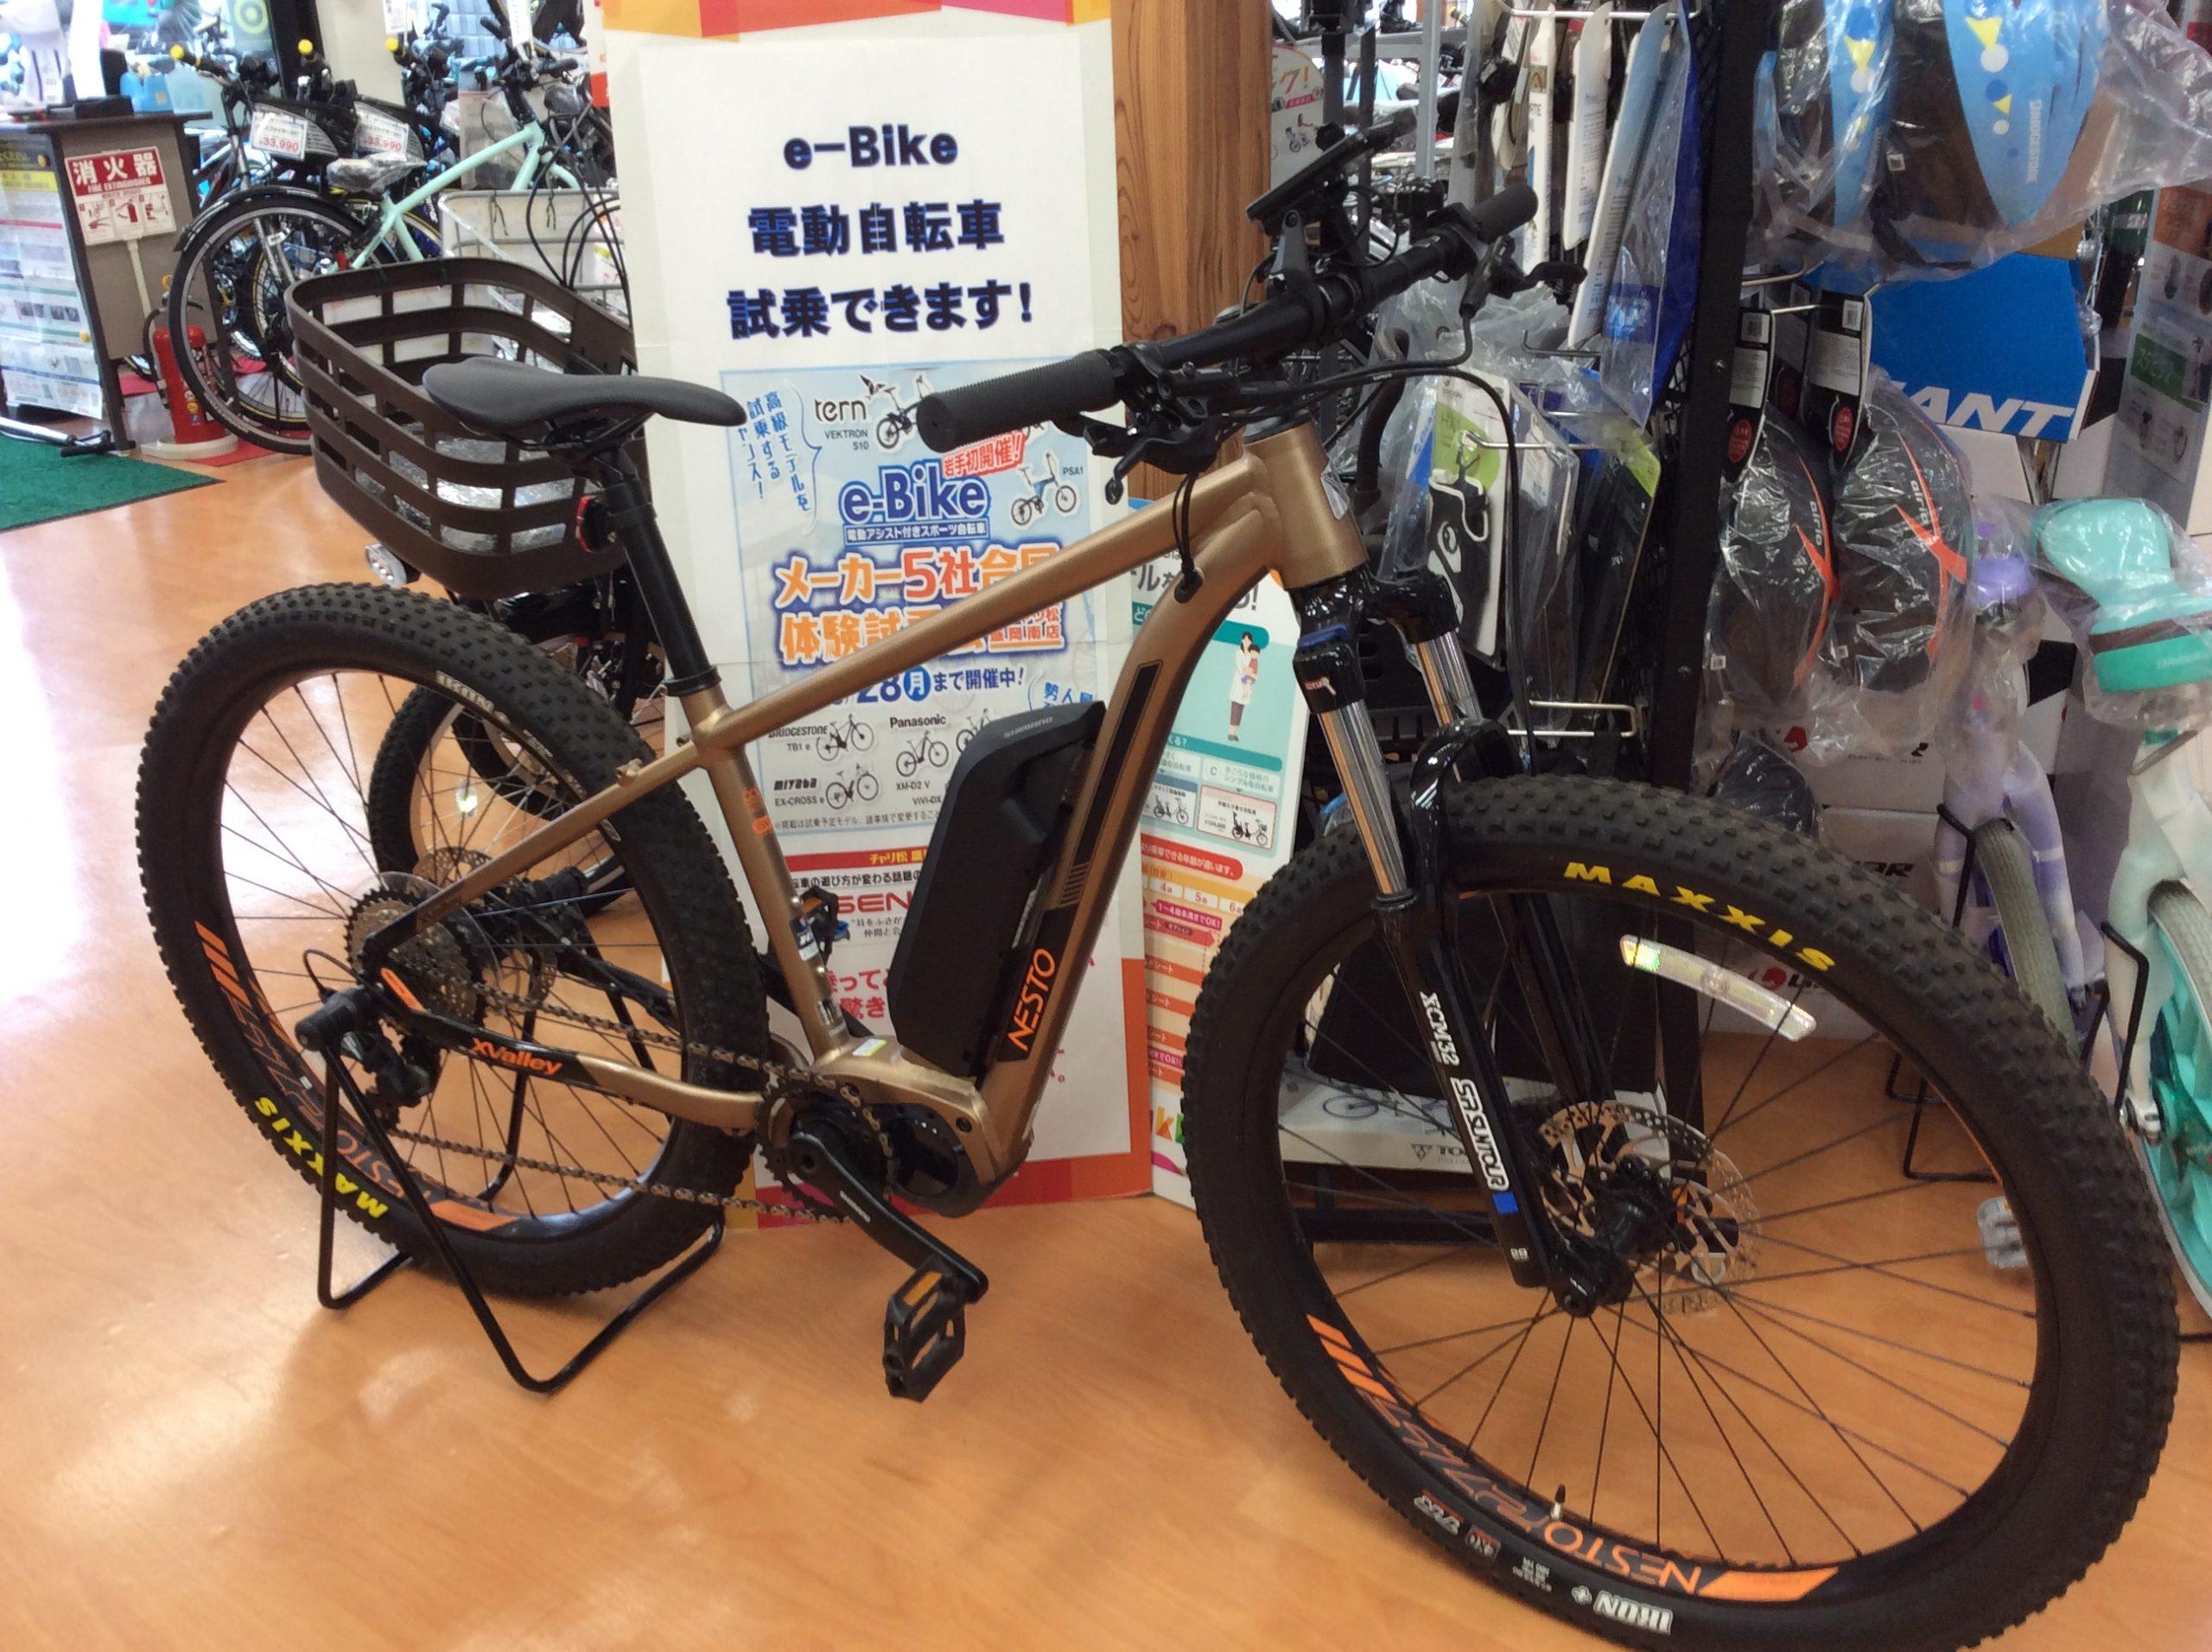 e-Bikeメーカー5社合同体験試乗会 6月28日(月)まで開催中‼︎